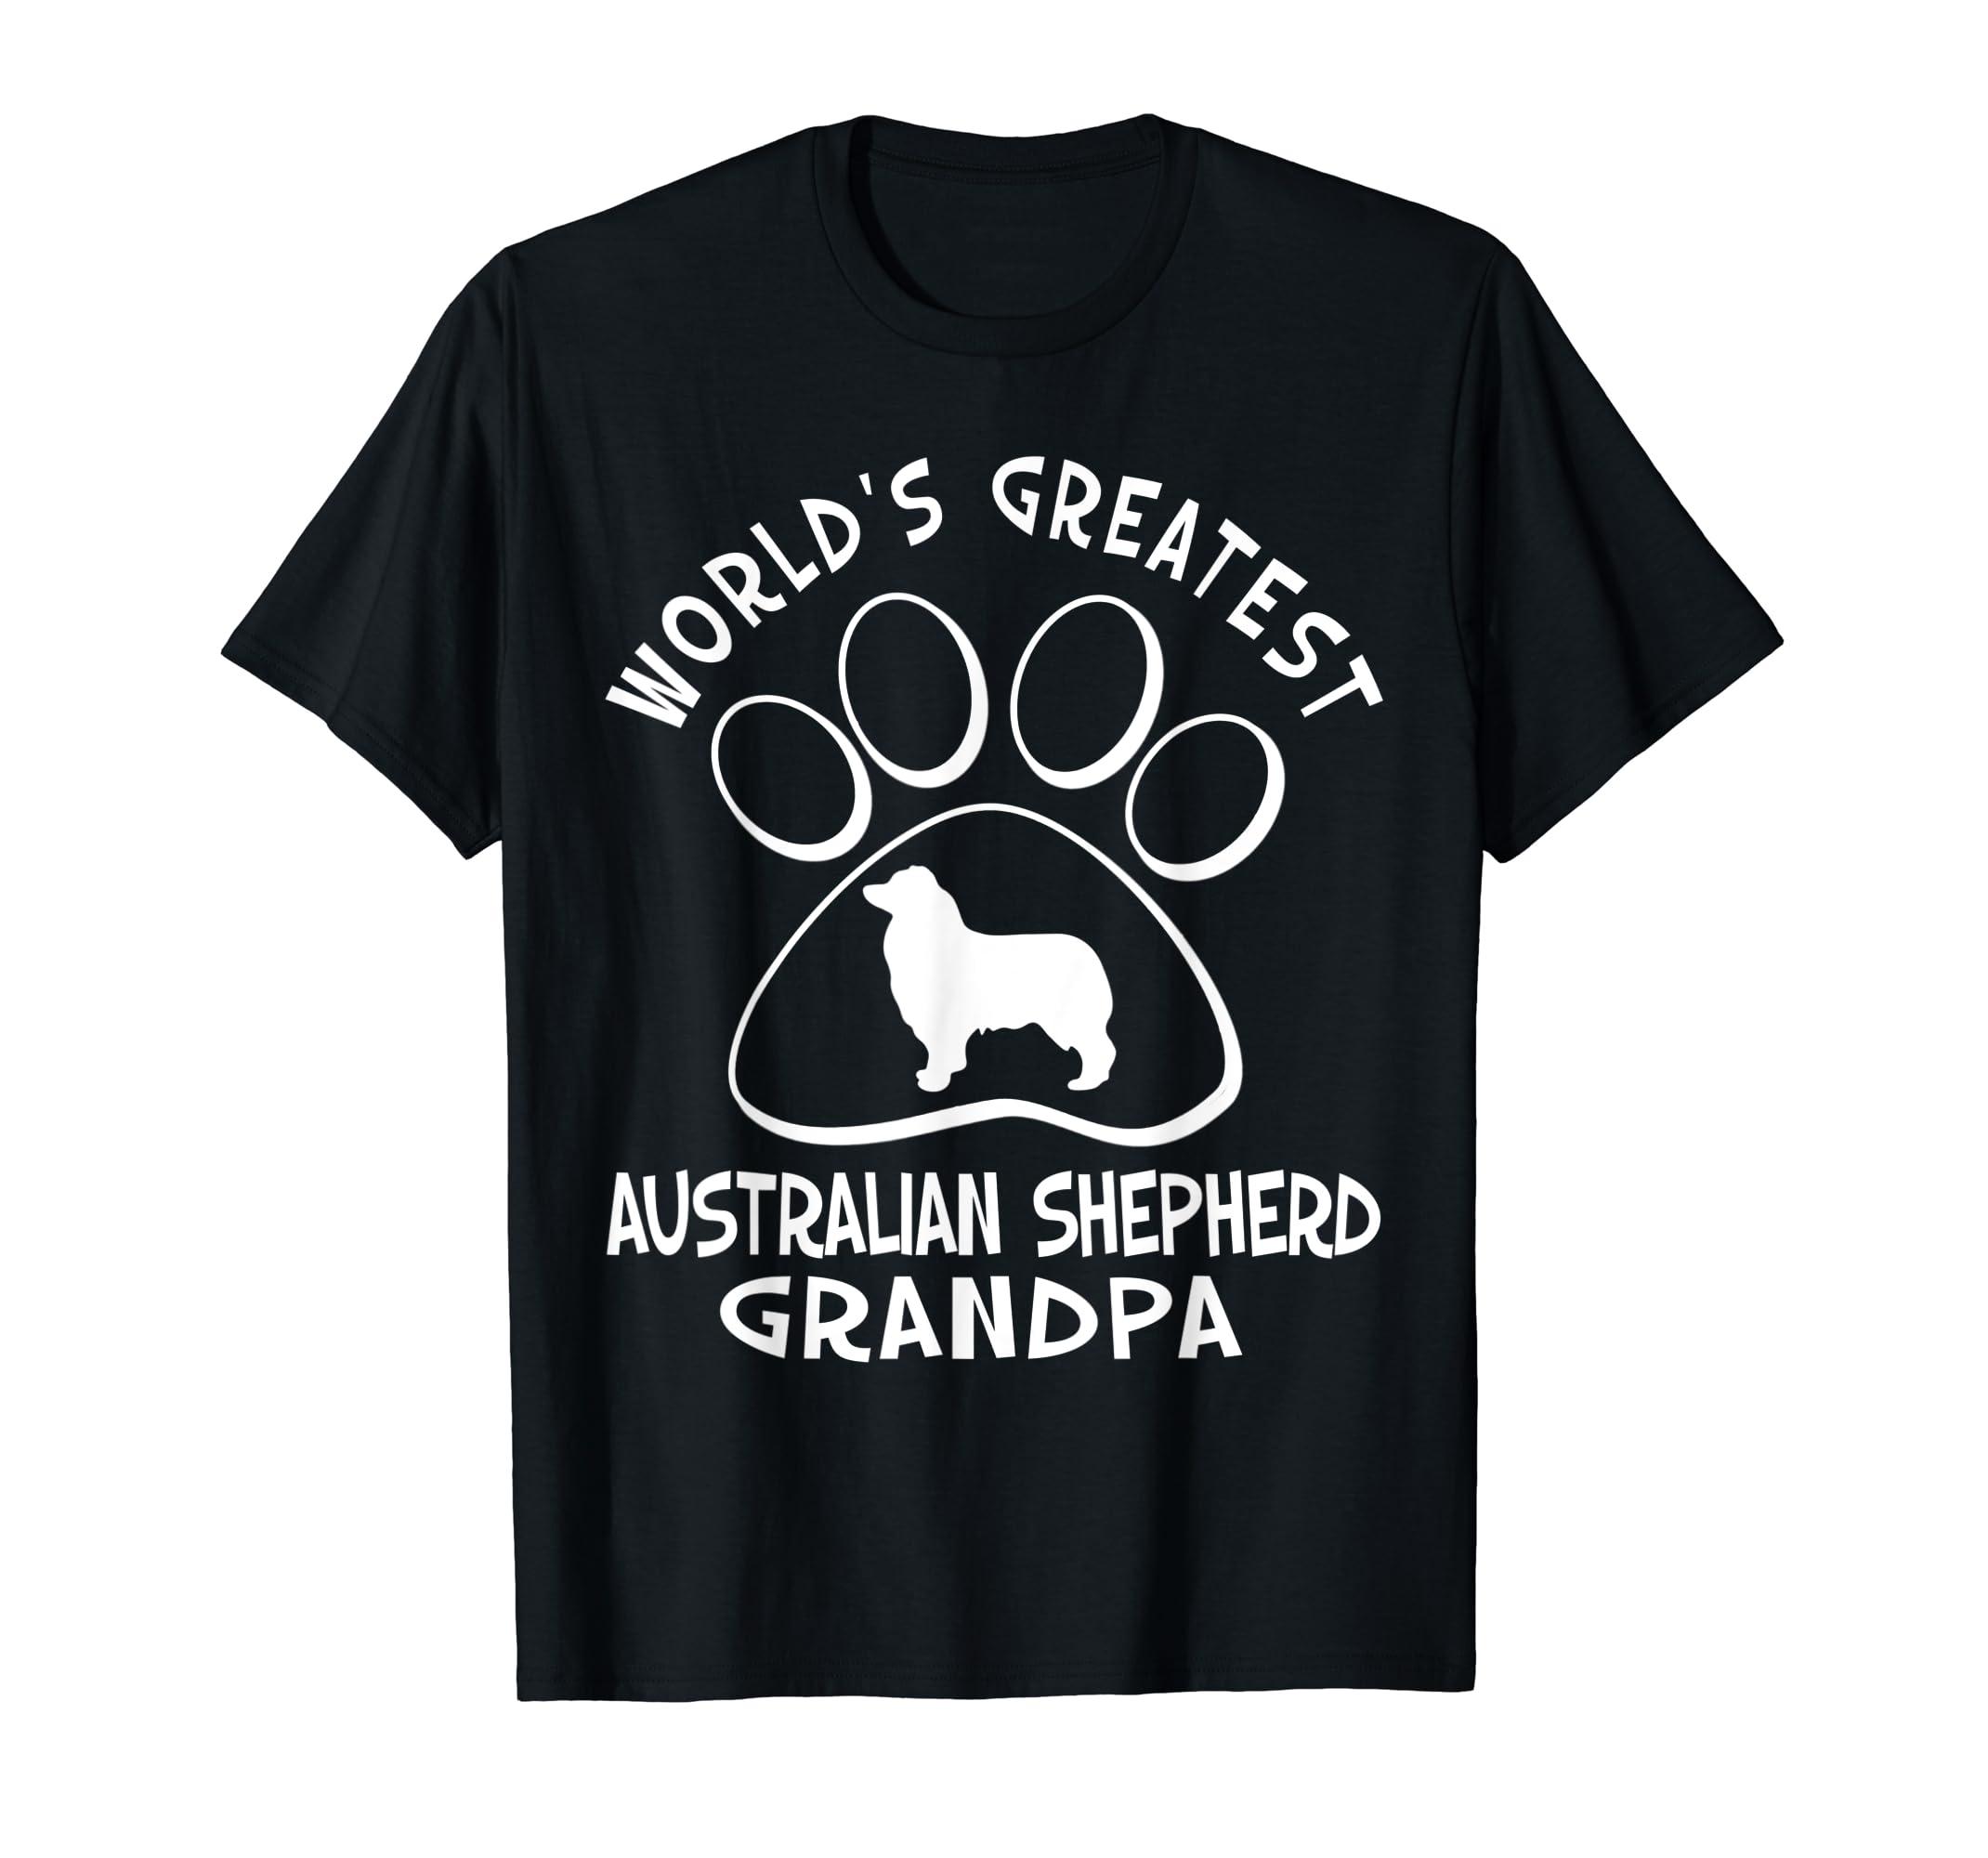 World's Greatest Australian Shepherd Grandpa T-Shirt-Men's T-Shirt-Black